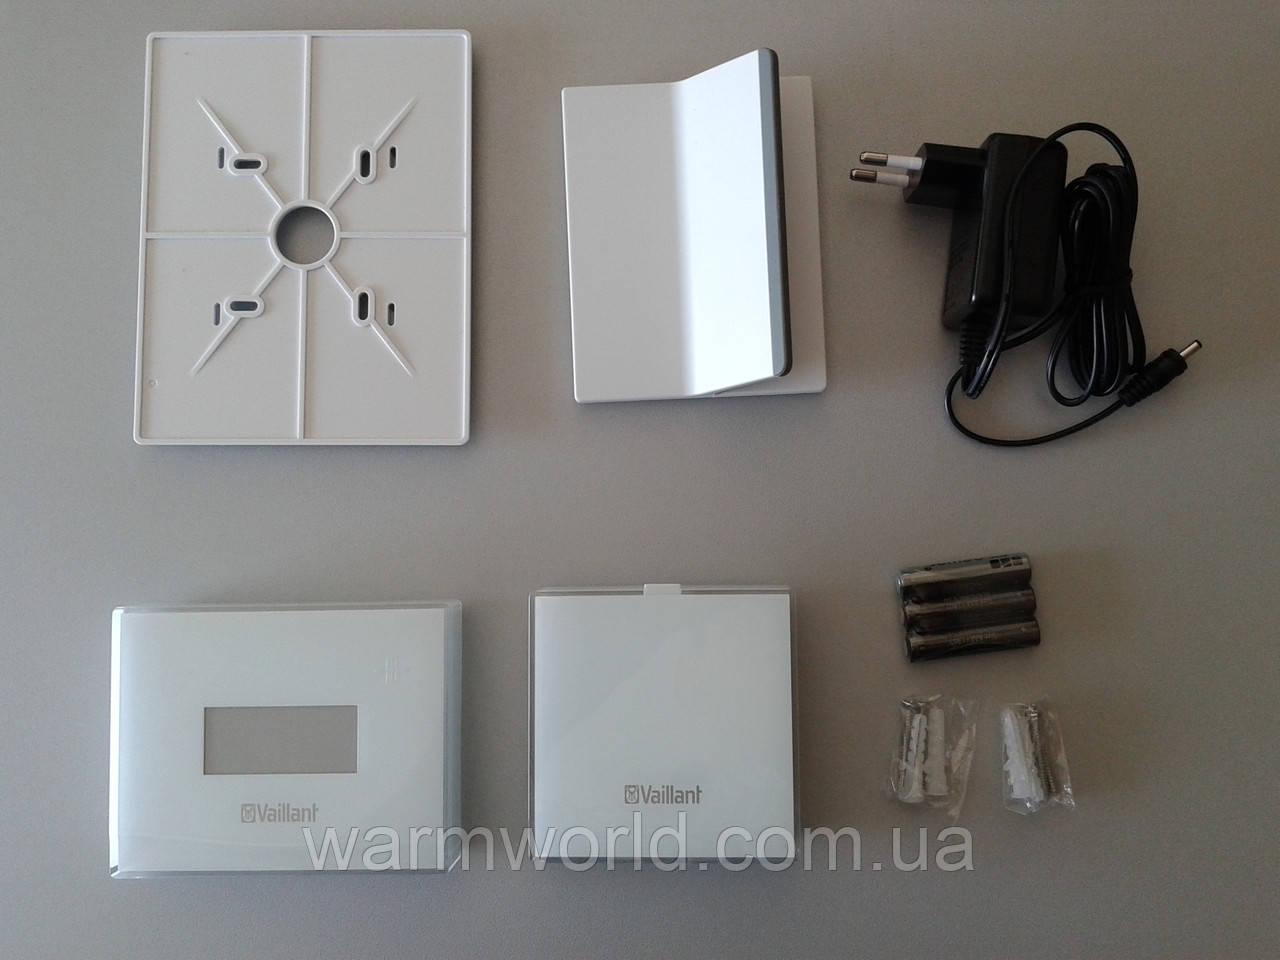 ERELAX WiFi Регулятор для котла Vaillant